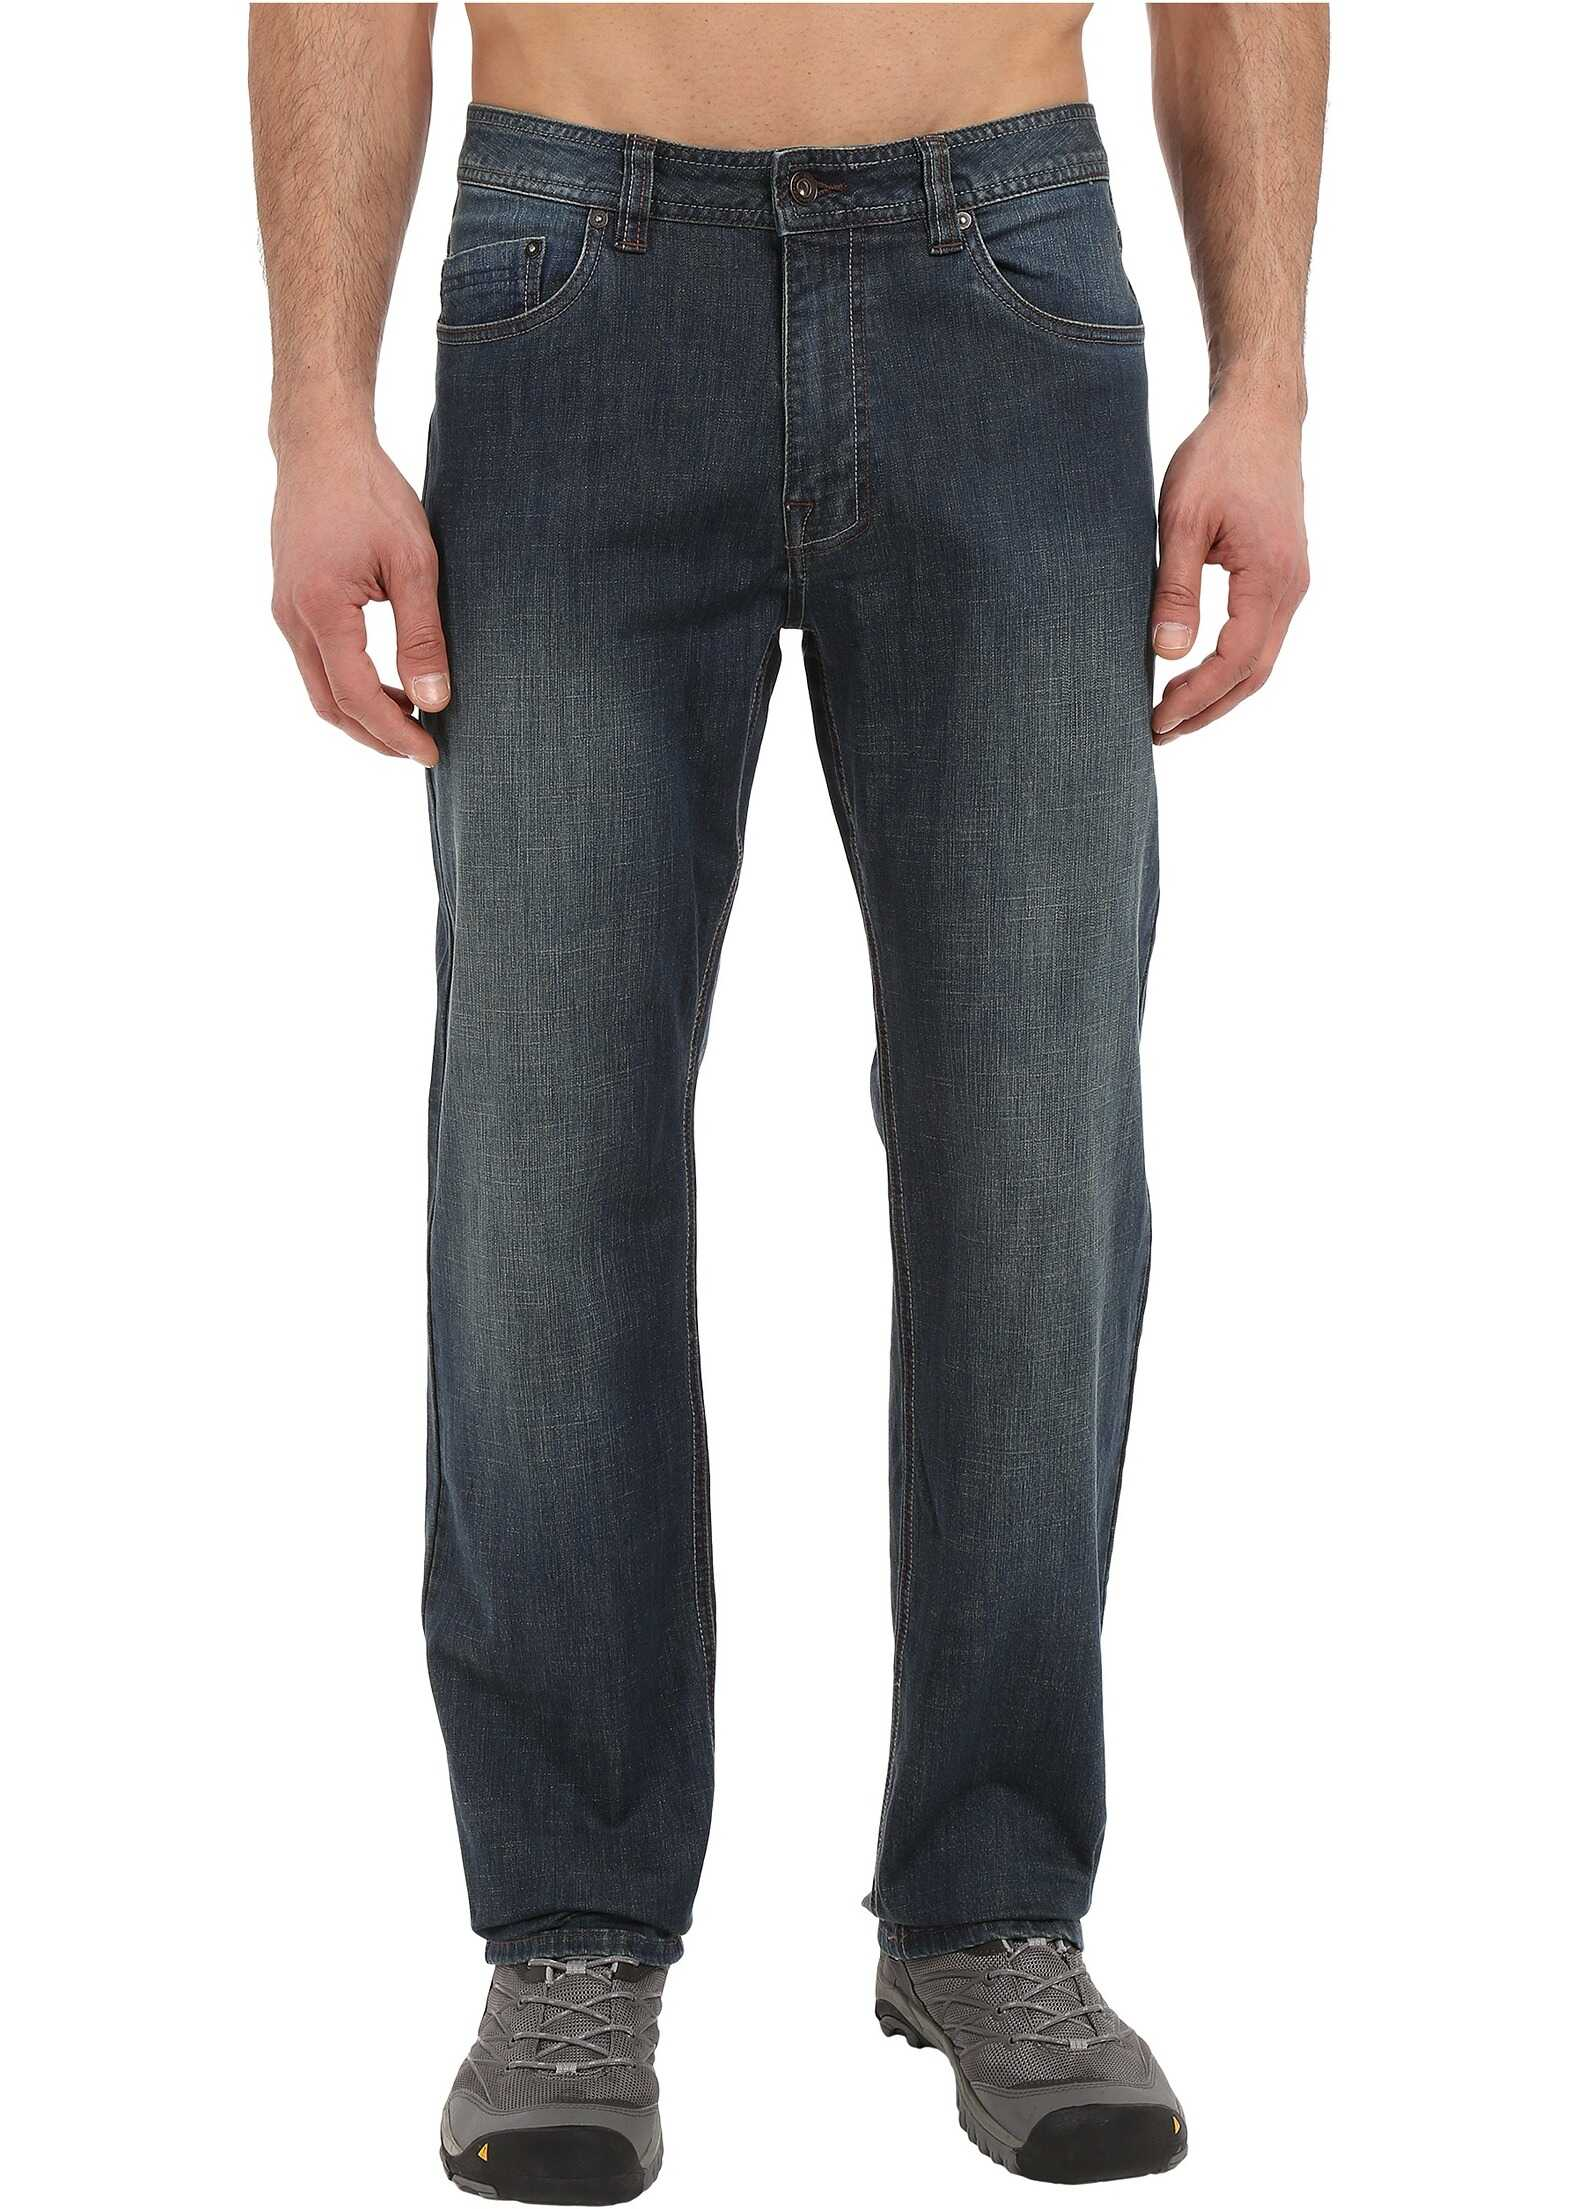 Blugi Barbati Prana Rogan Jeans Antique Stone Wash